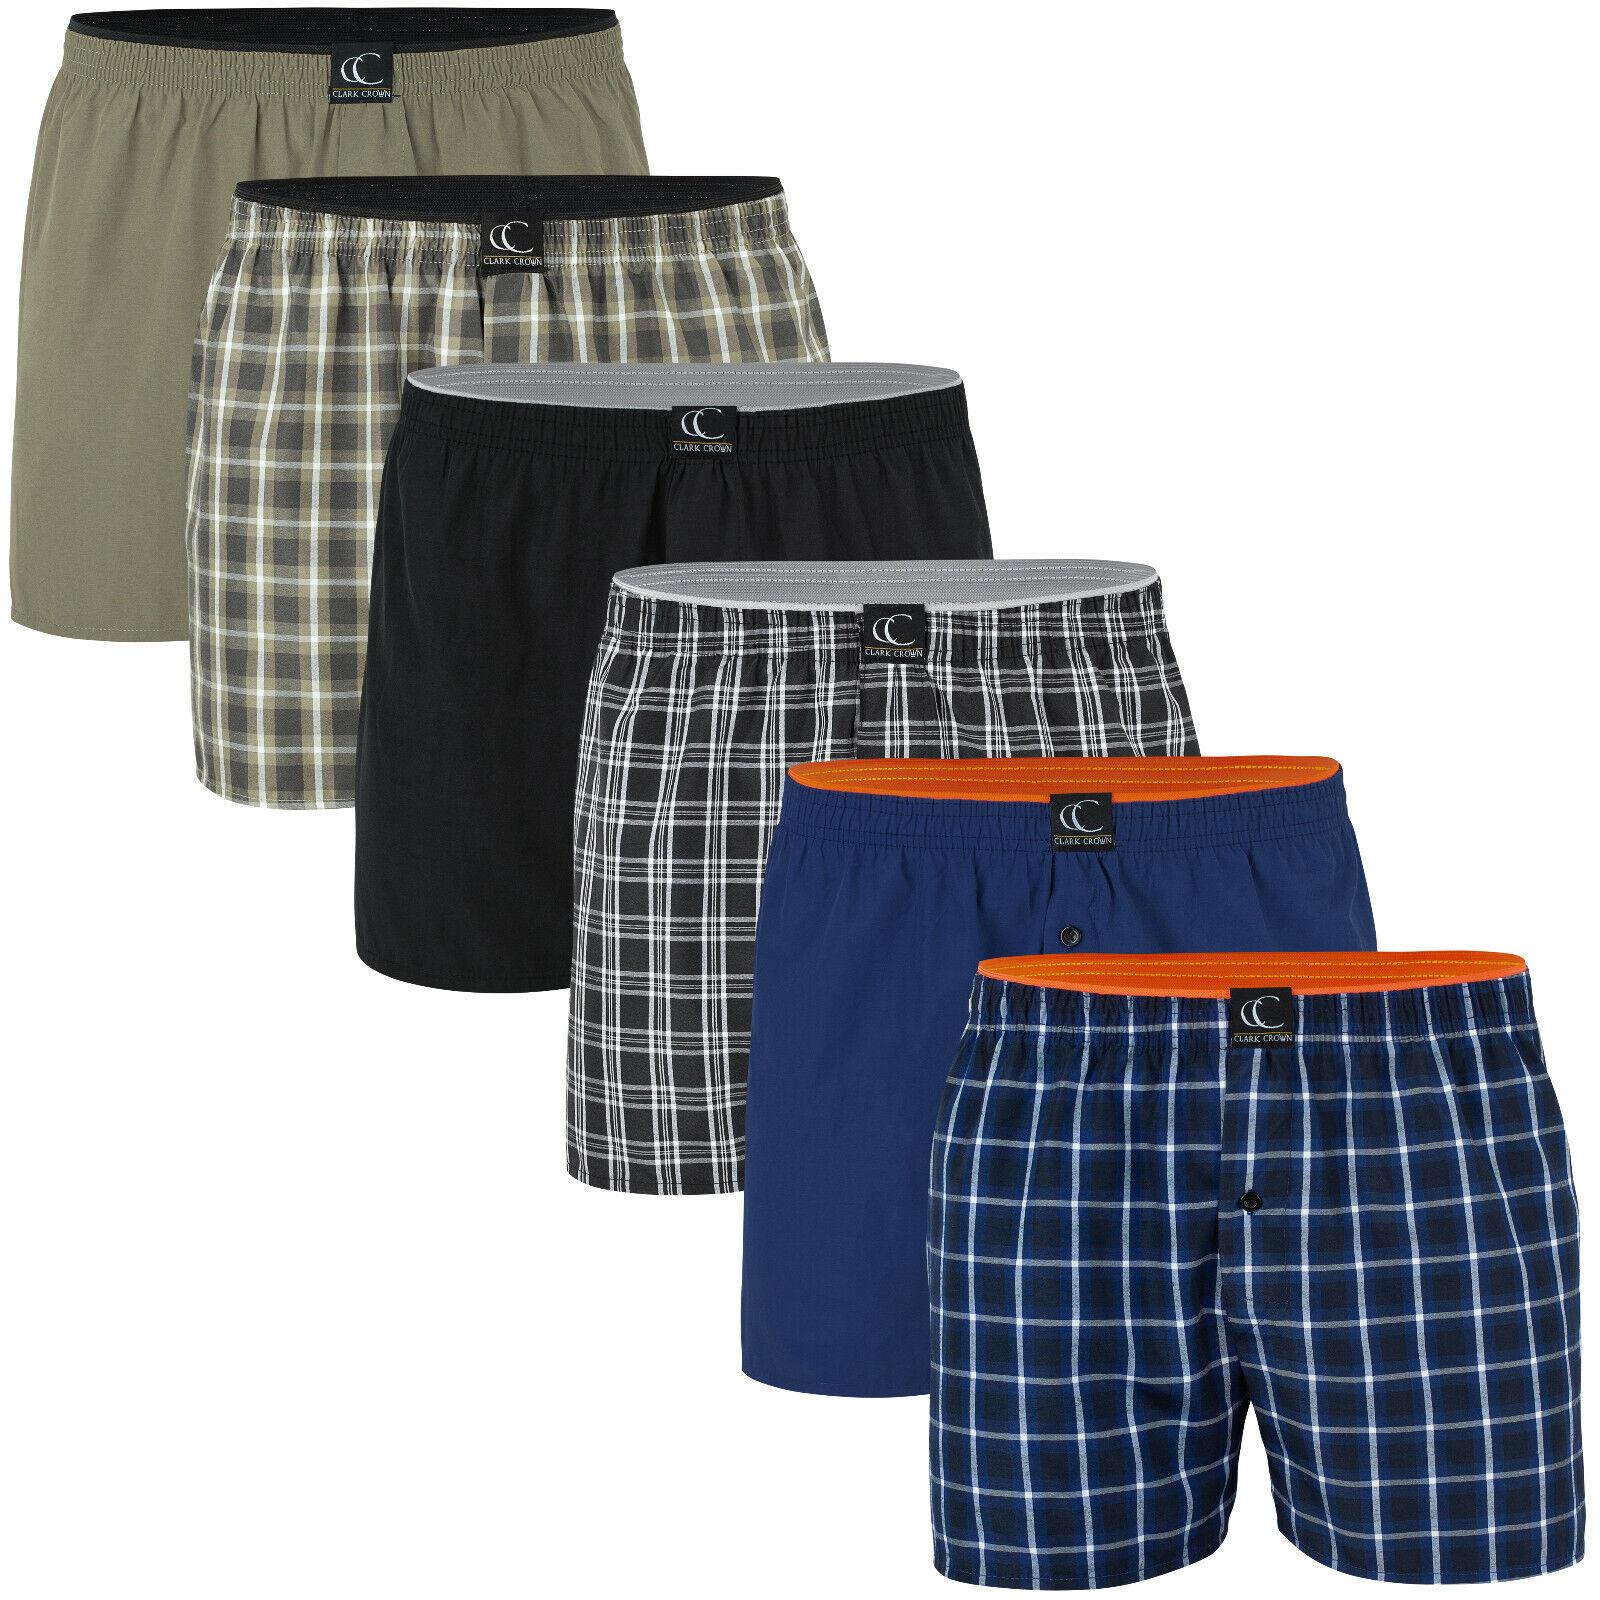 6er Pack Boxershorts American Style Webboxer Herren Boxer Shorts Kariert Uni